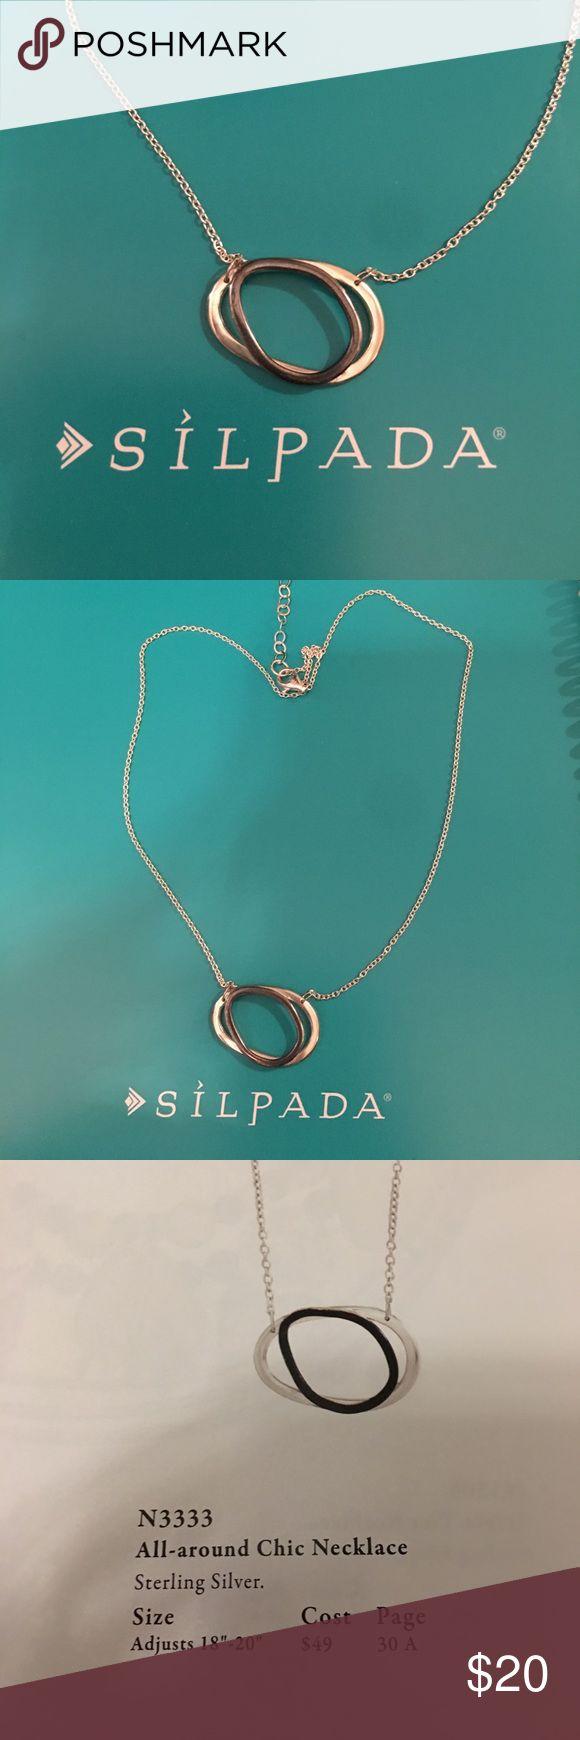 Silpada designs all around chic necklace sterling Silpada designs all around chic necklace sterling silver Silpada Jewelry Necklaces